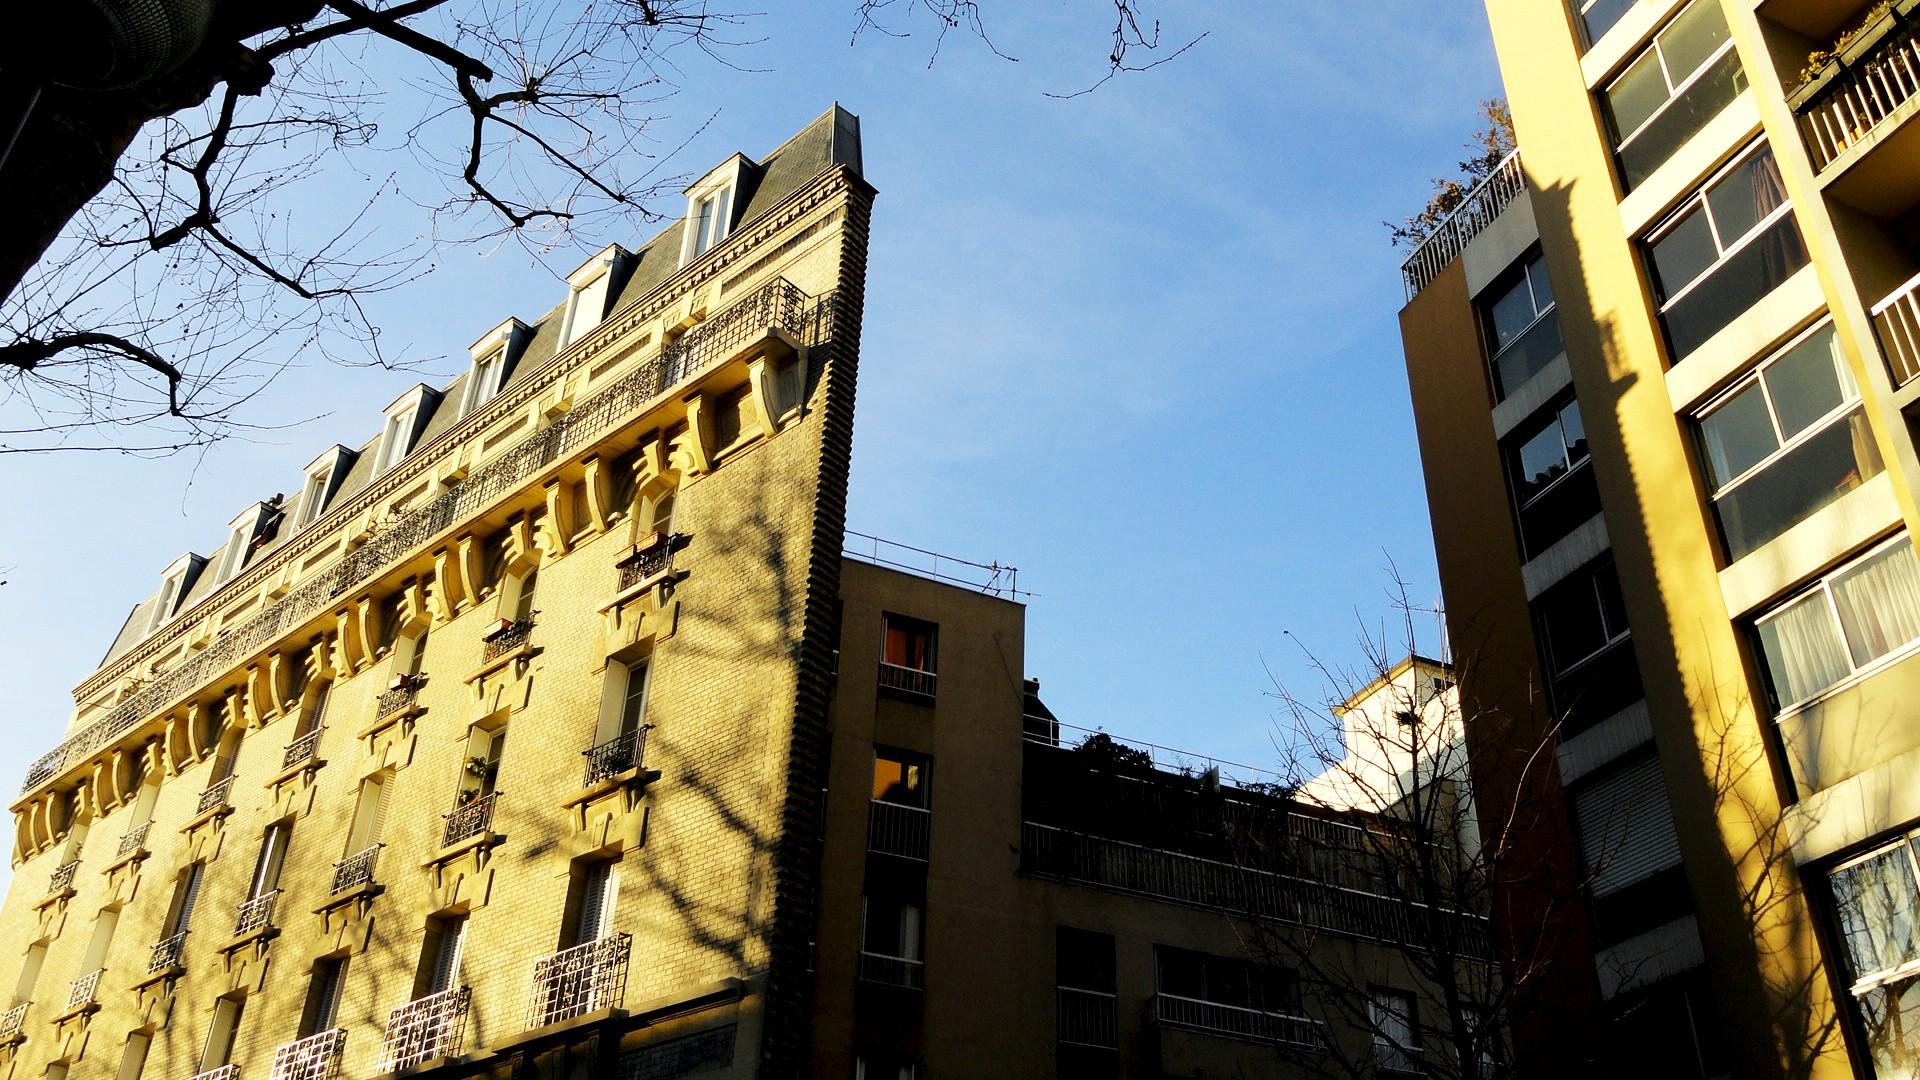 Balade le long de la Petite Ceinture (17e et 18e) - Façade rue Leibniz